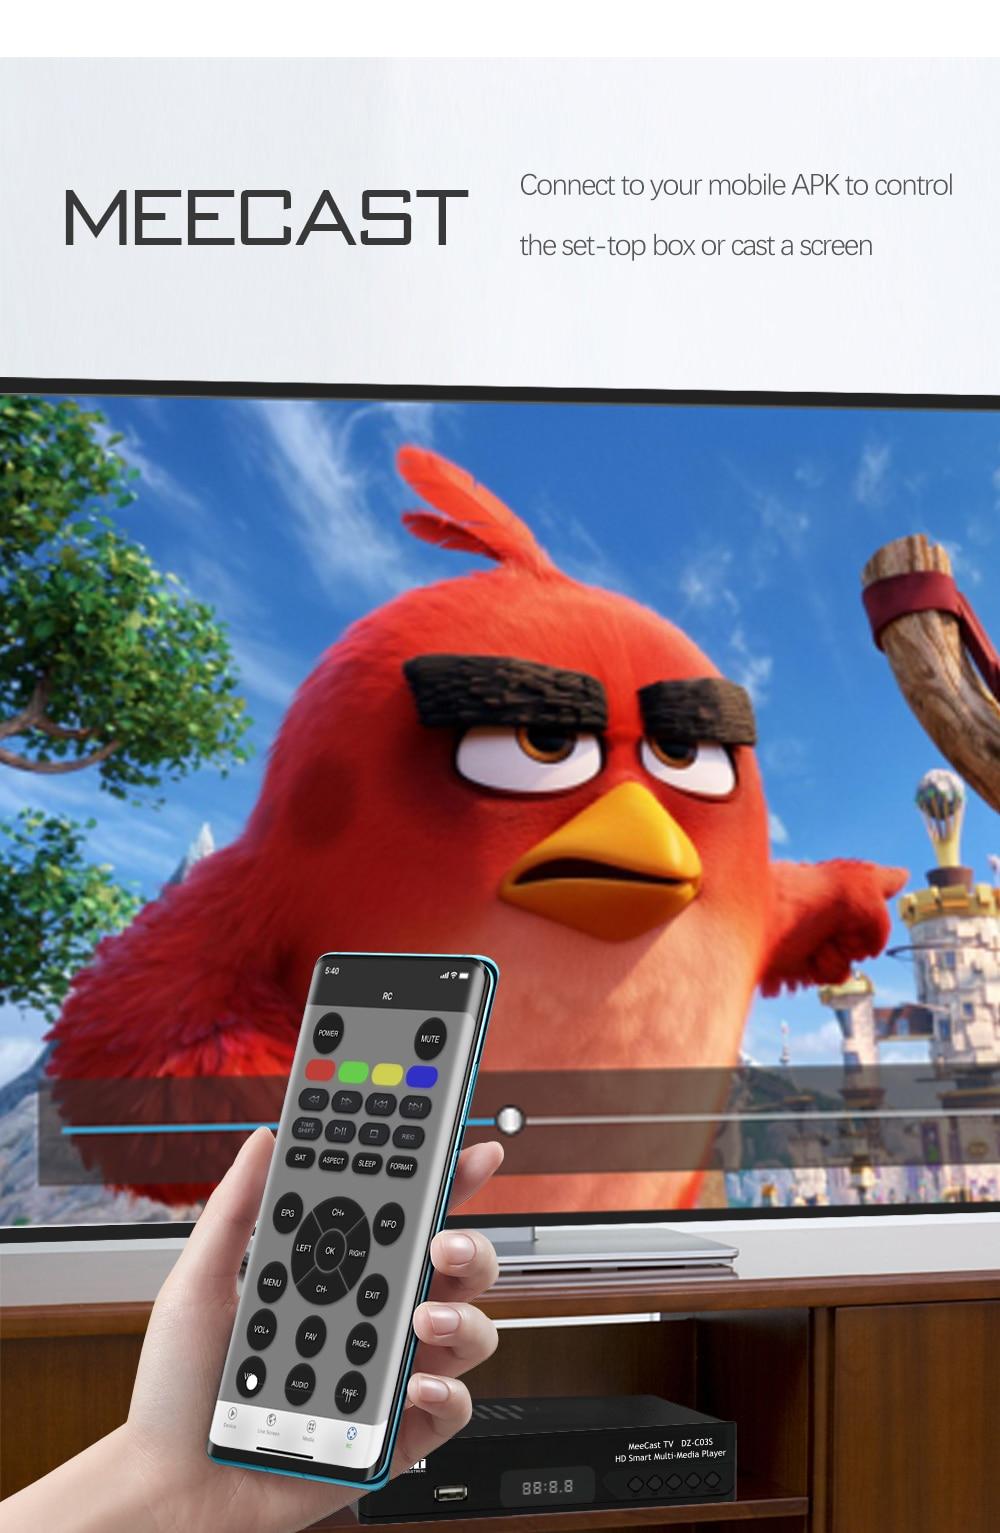 Digital Terrestrial ISDB-T TV Tuner Receiver Set-Top Box Fully HD 1080P H.264 USB Decoder Brazil Chile Peru Costa Rica 21